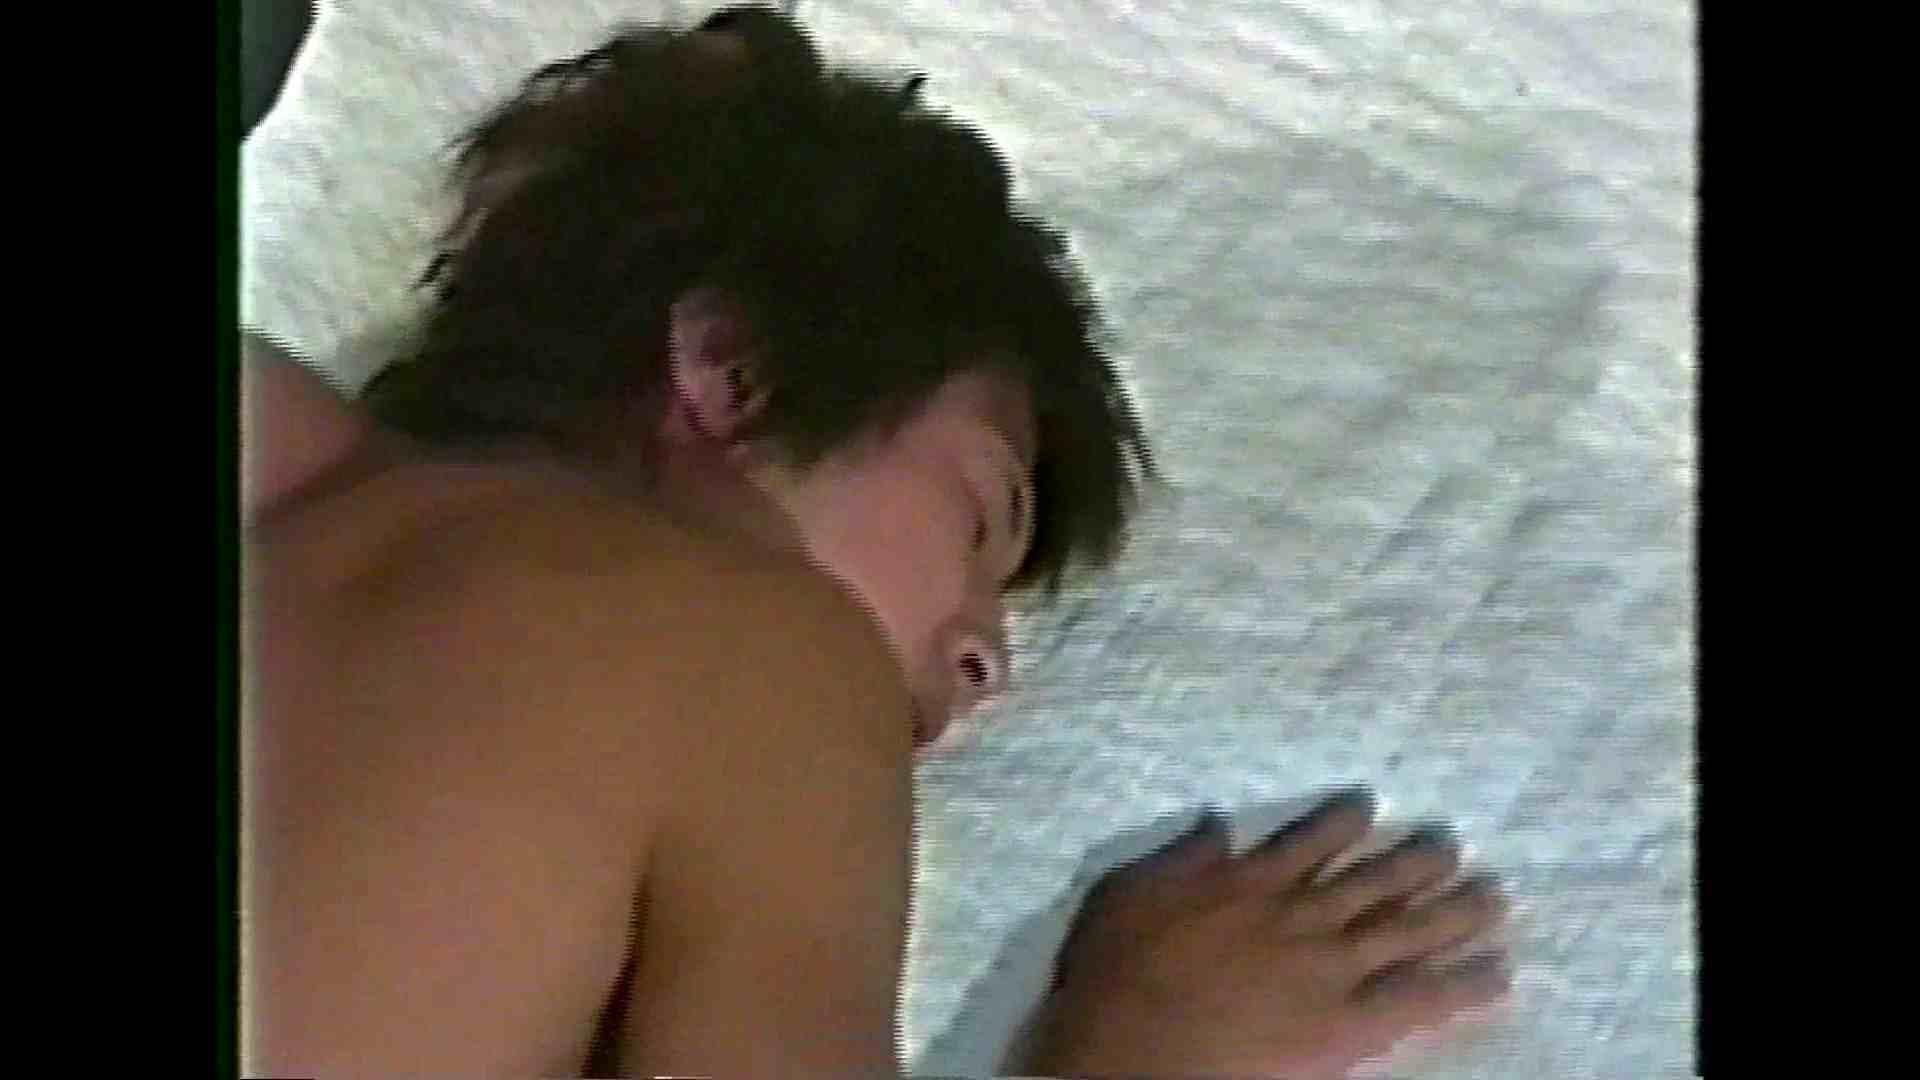 GAYBOY宏のオカズ倉庫Vol.3-3 ゲイのペニス Guyエロ画像 77枚 7